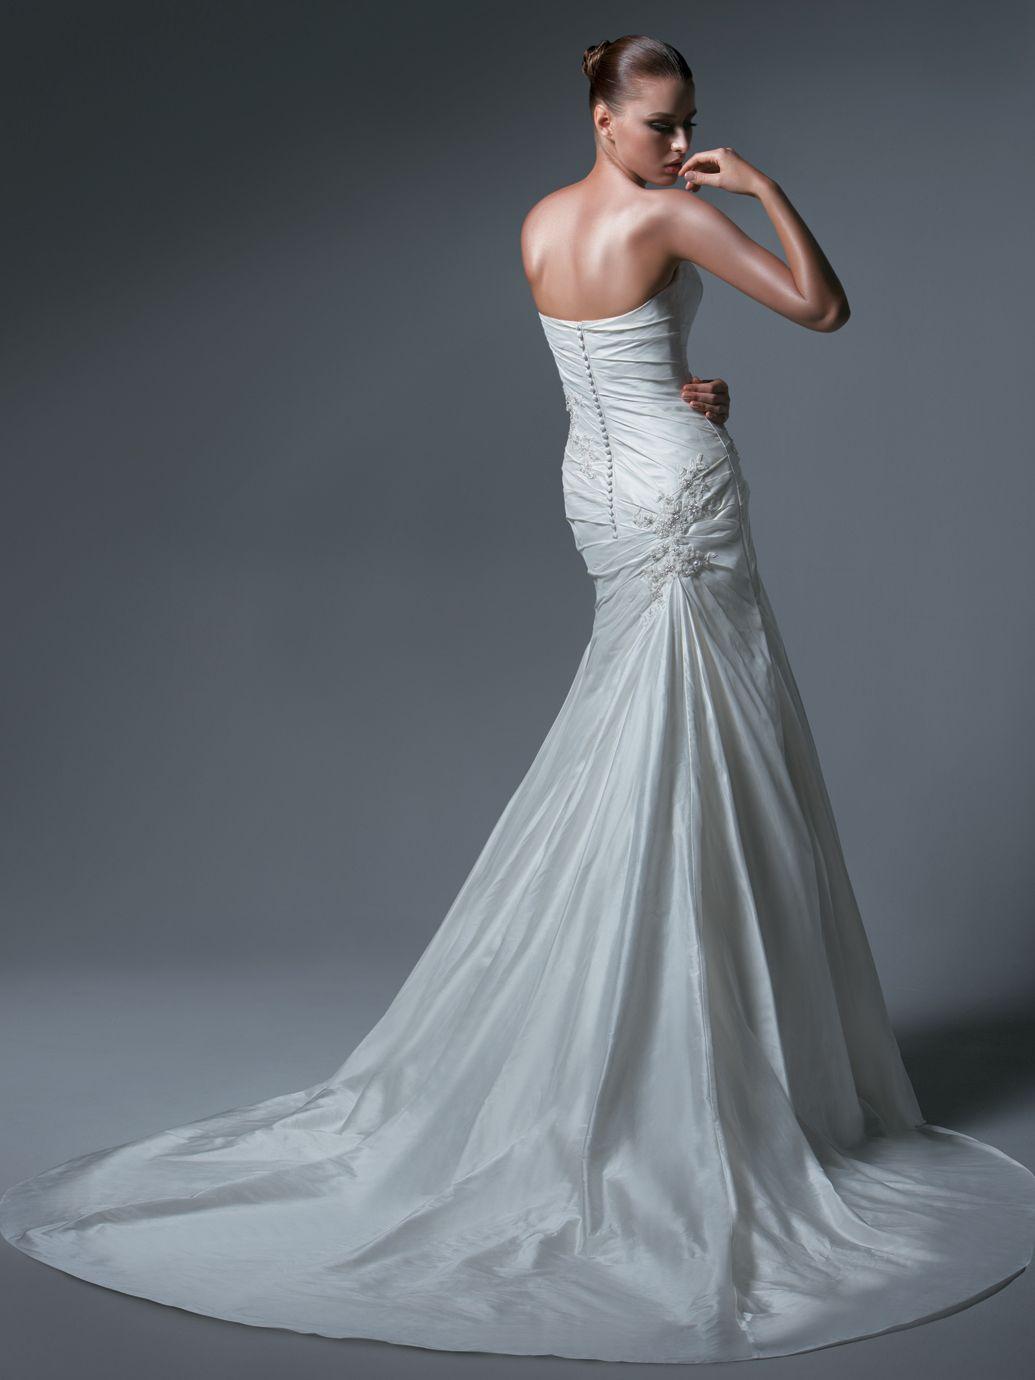 diamond wedding dresses collection